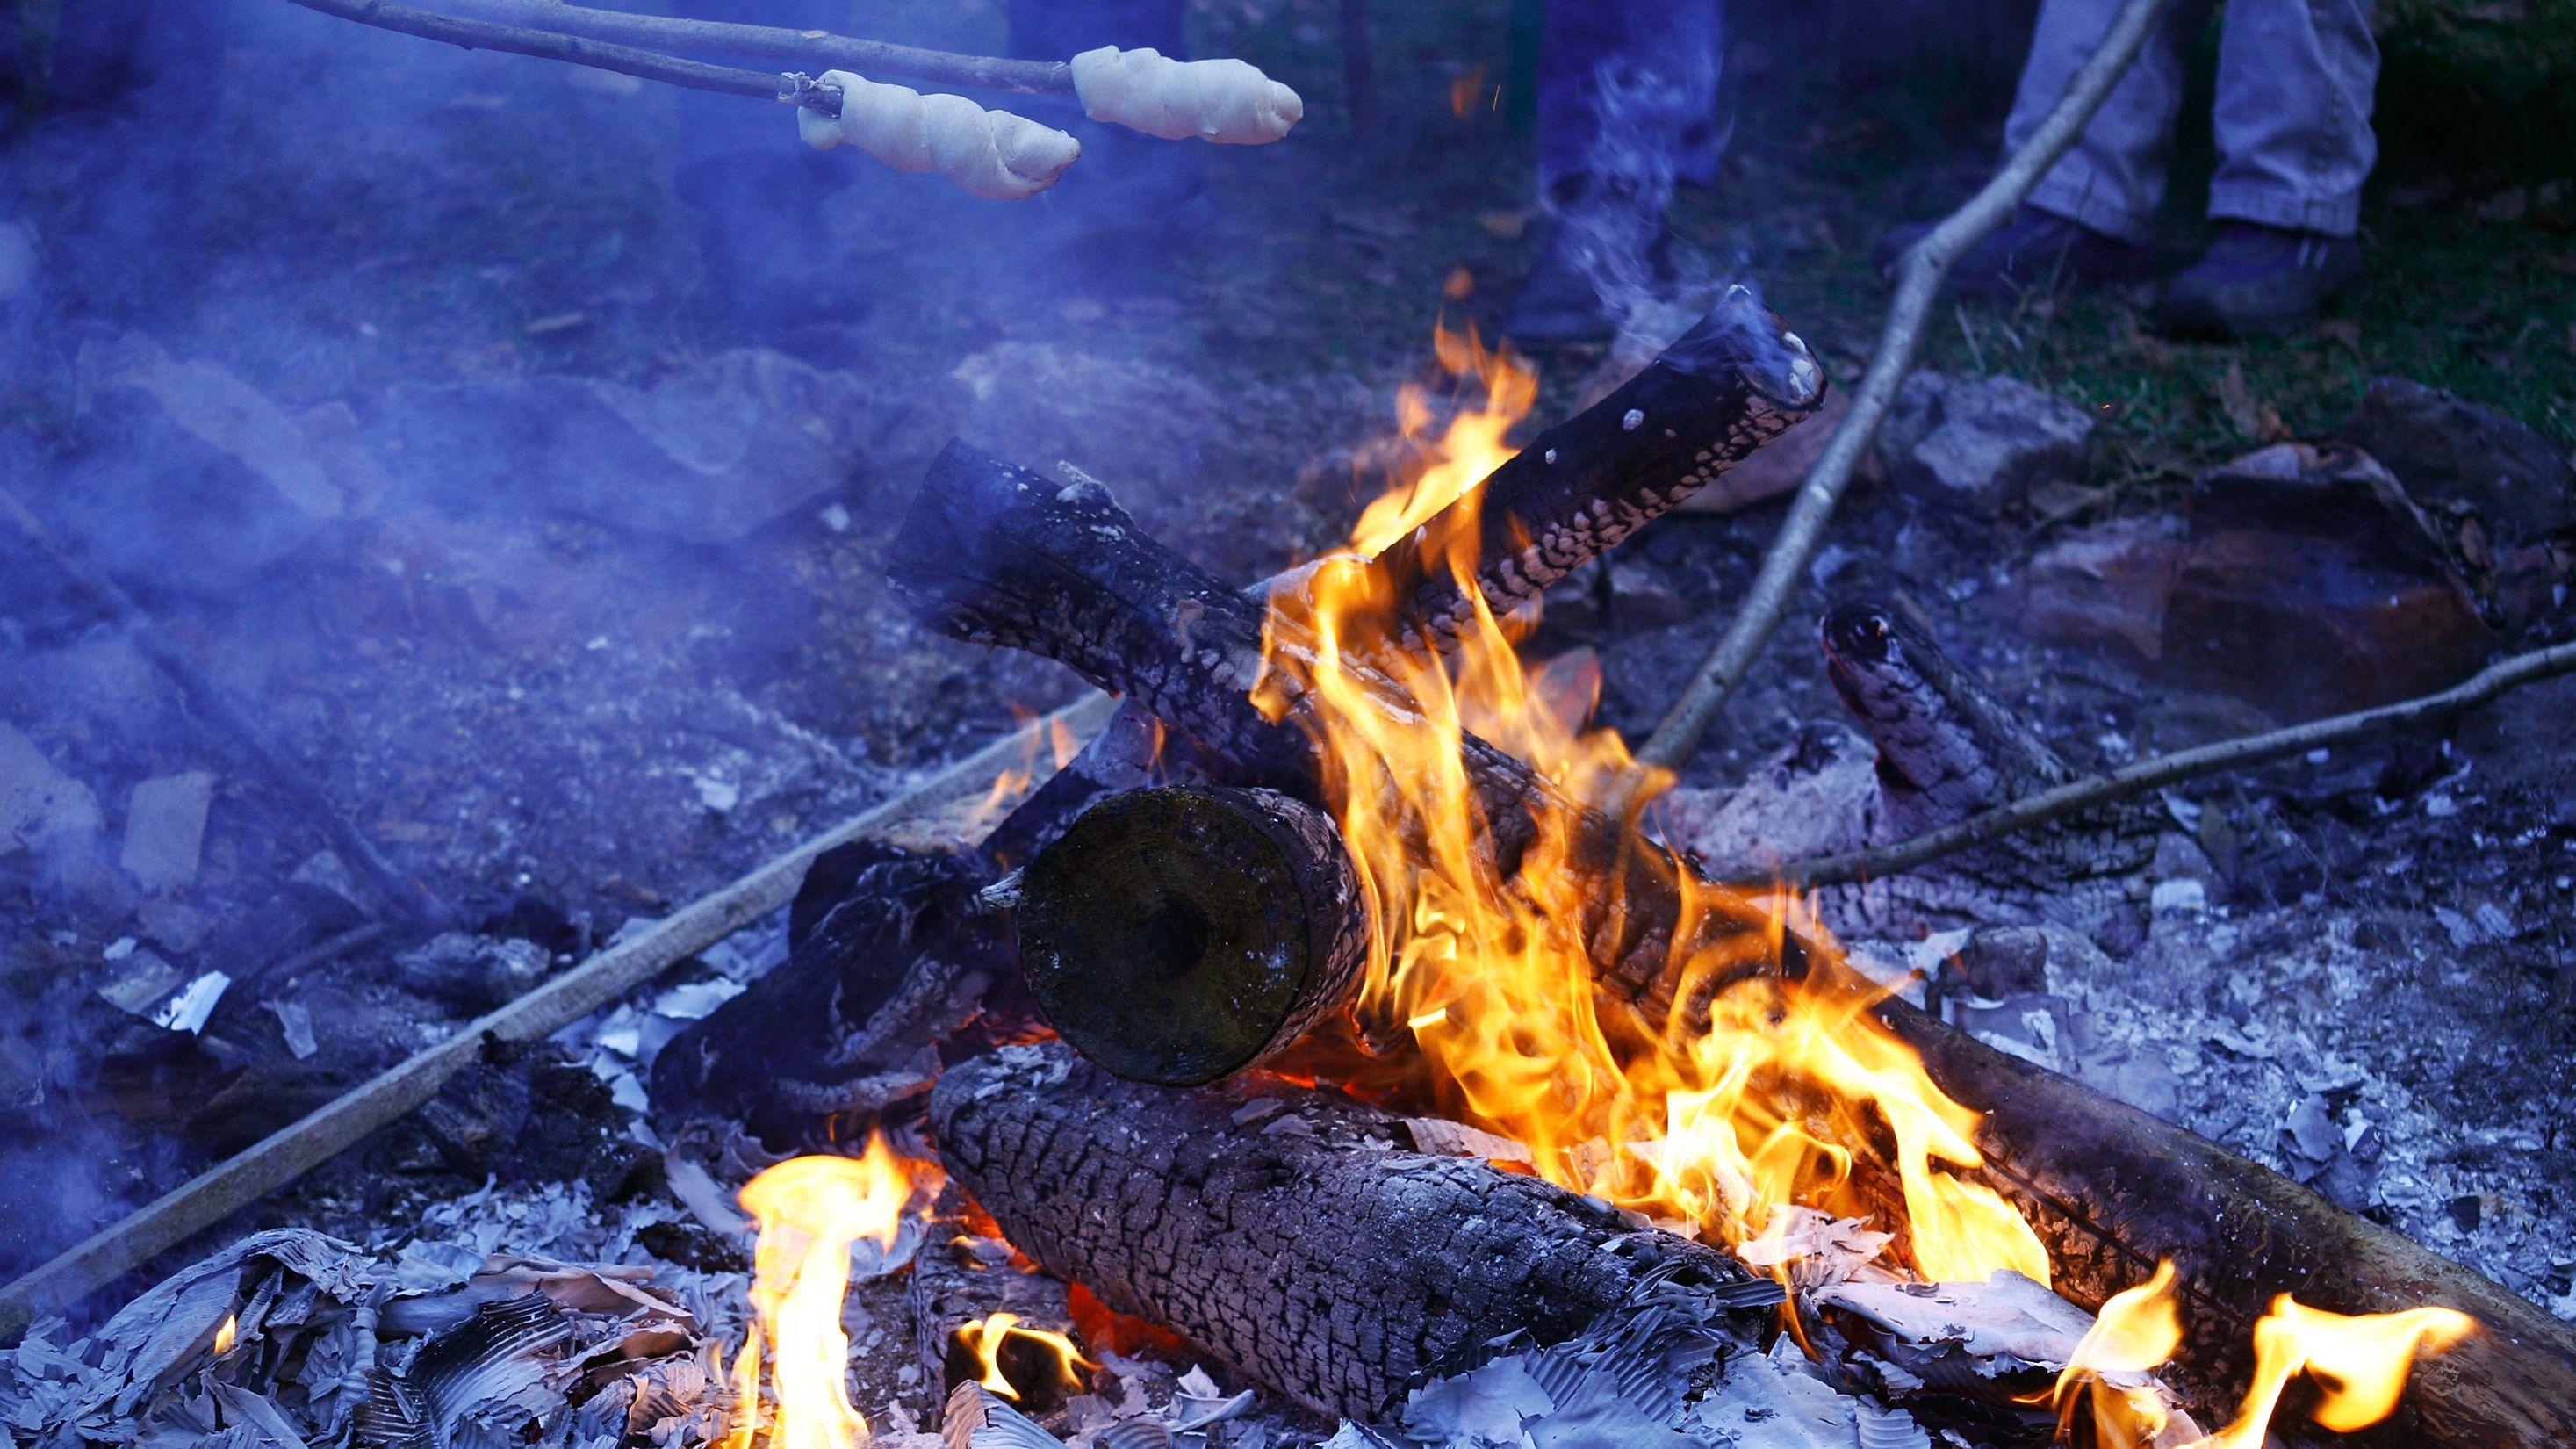 Kinder backen Stockbrot am offenen Feuer